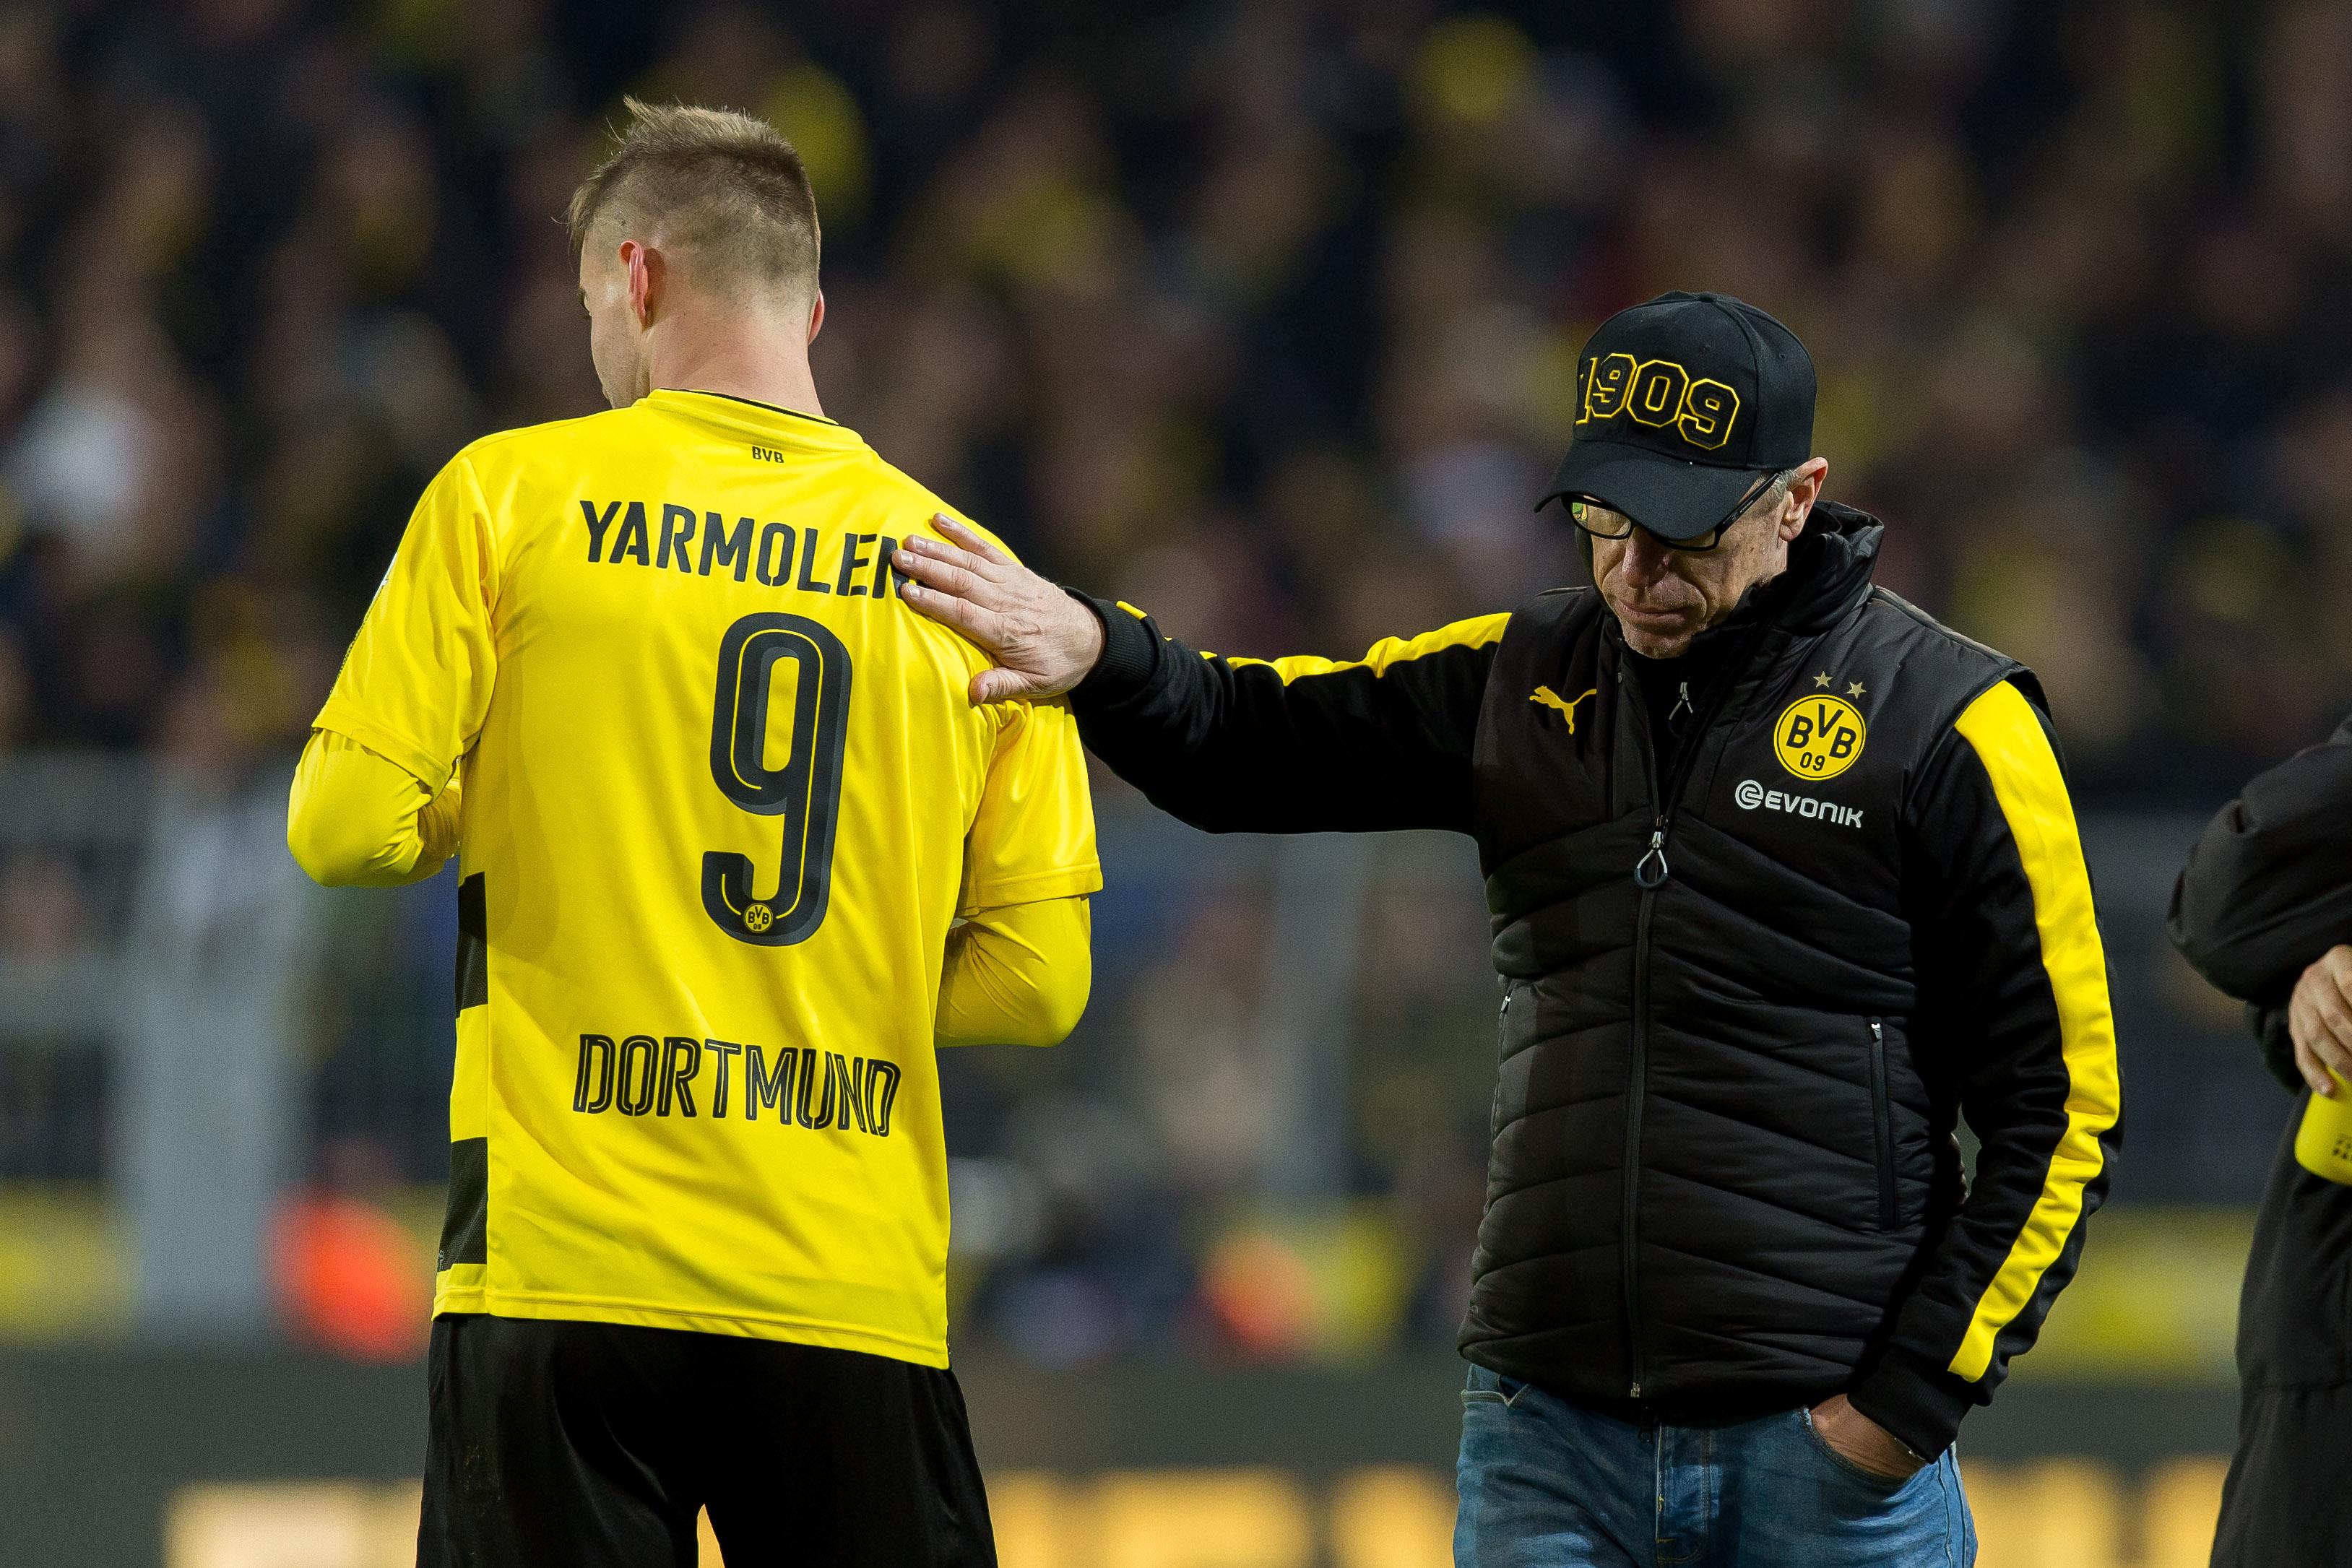 Dortmund Yarmolenko